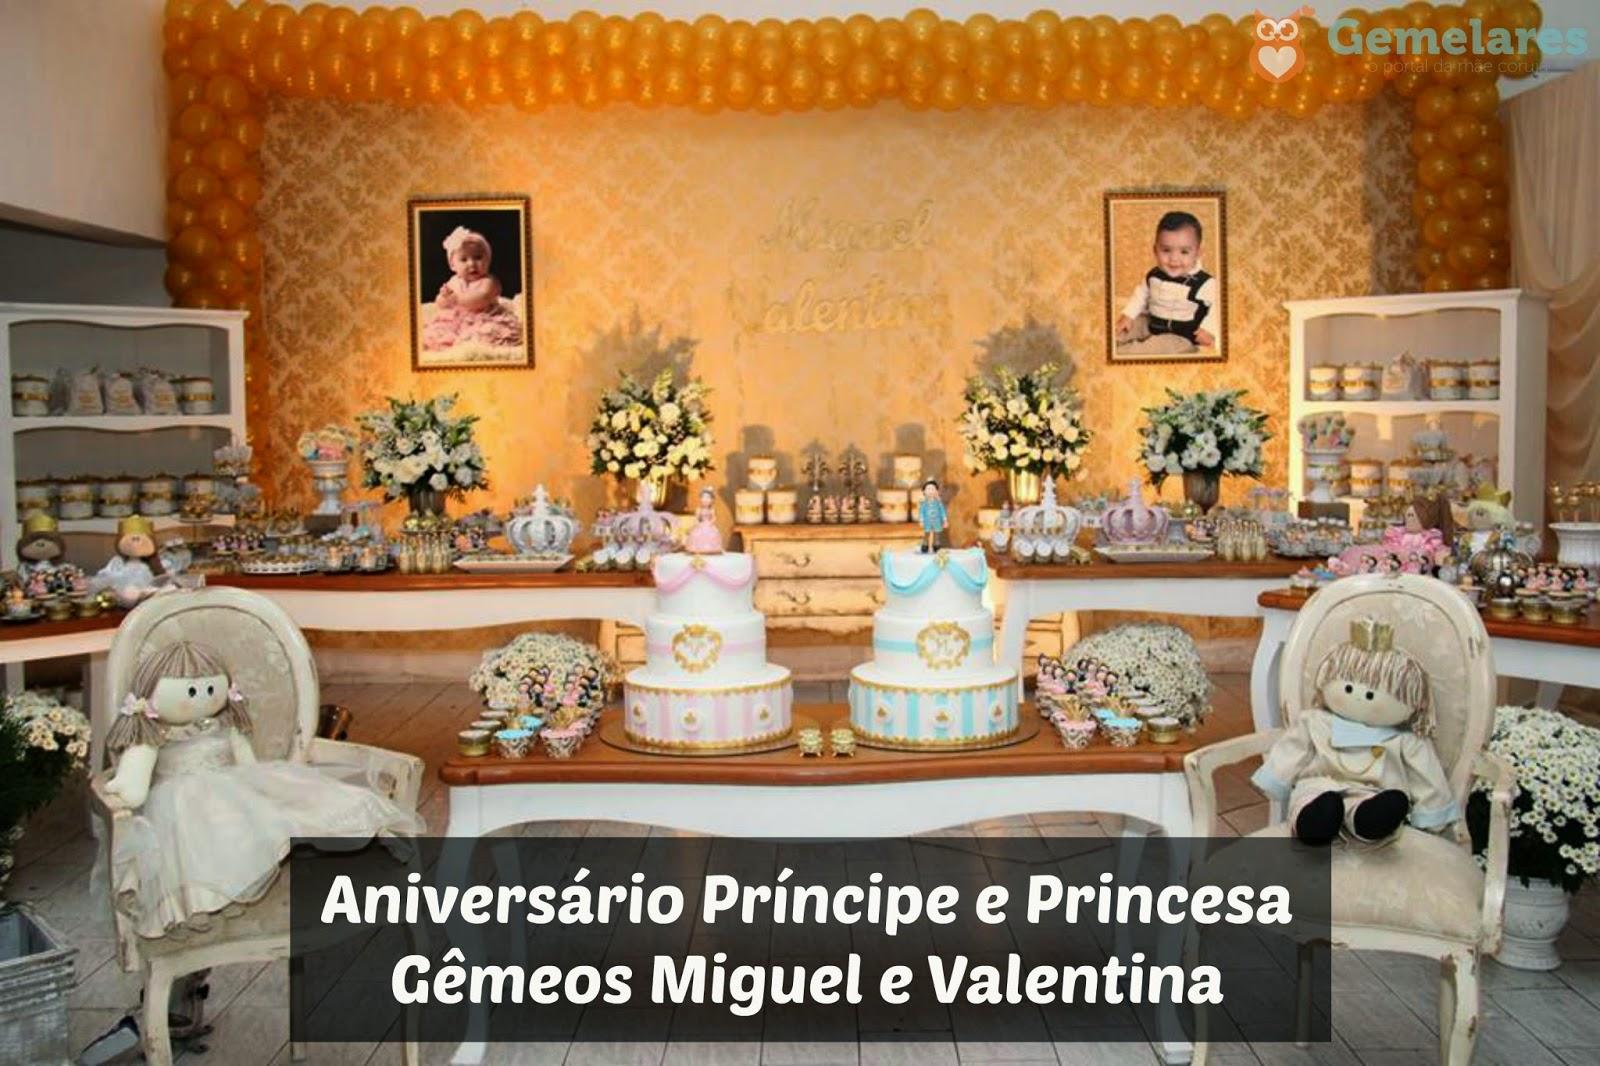 Well-known Aniversário Príncipe e Princesa - Gêmeos Miguel e Valentina  DH55